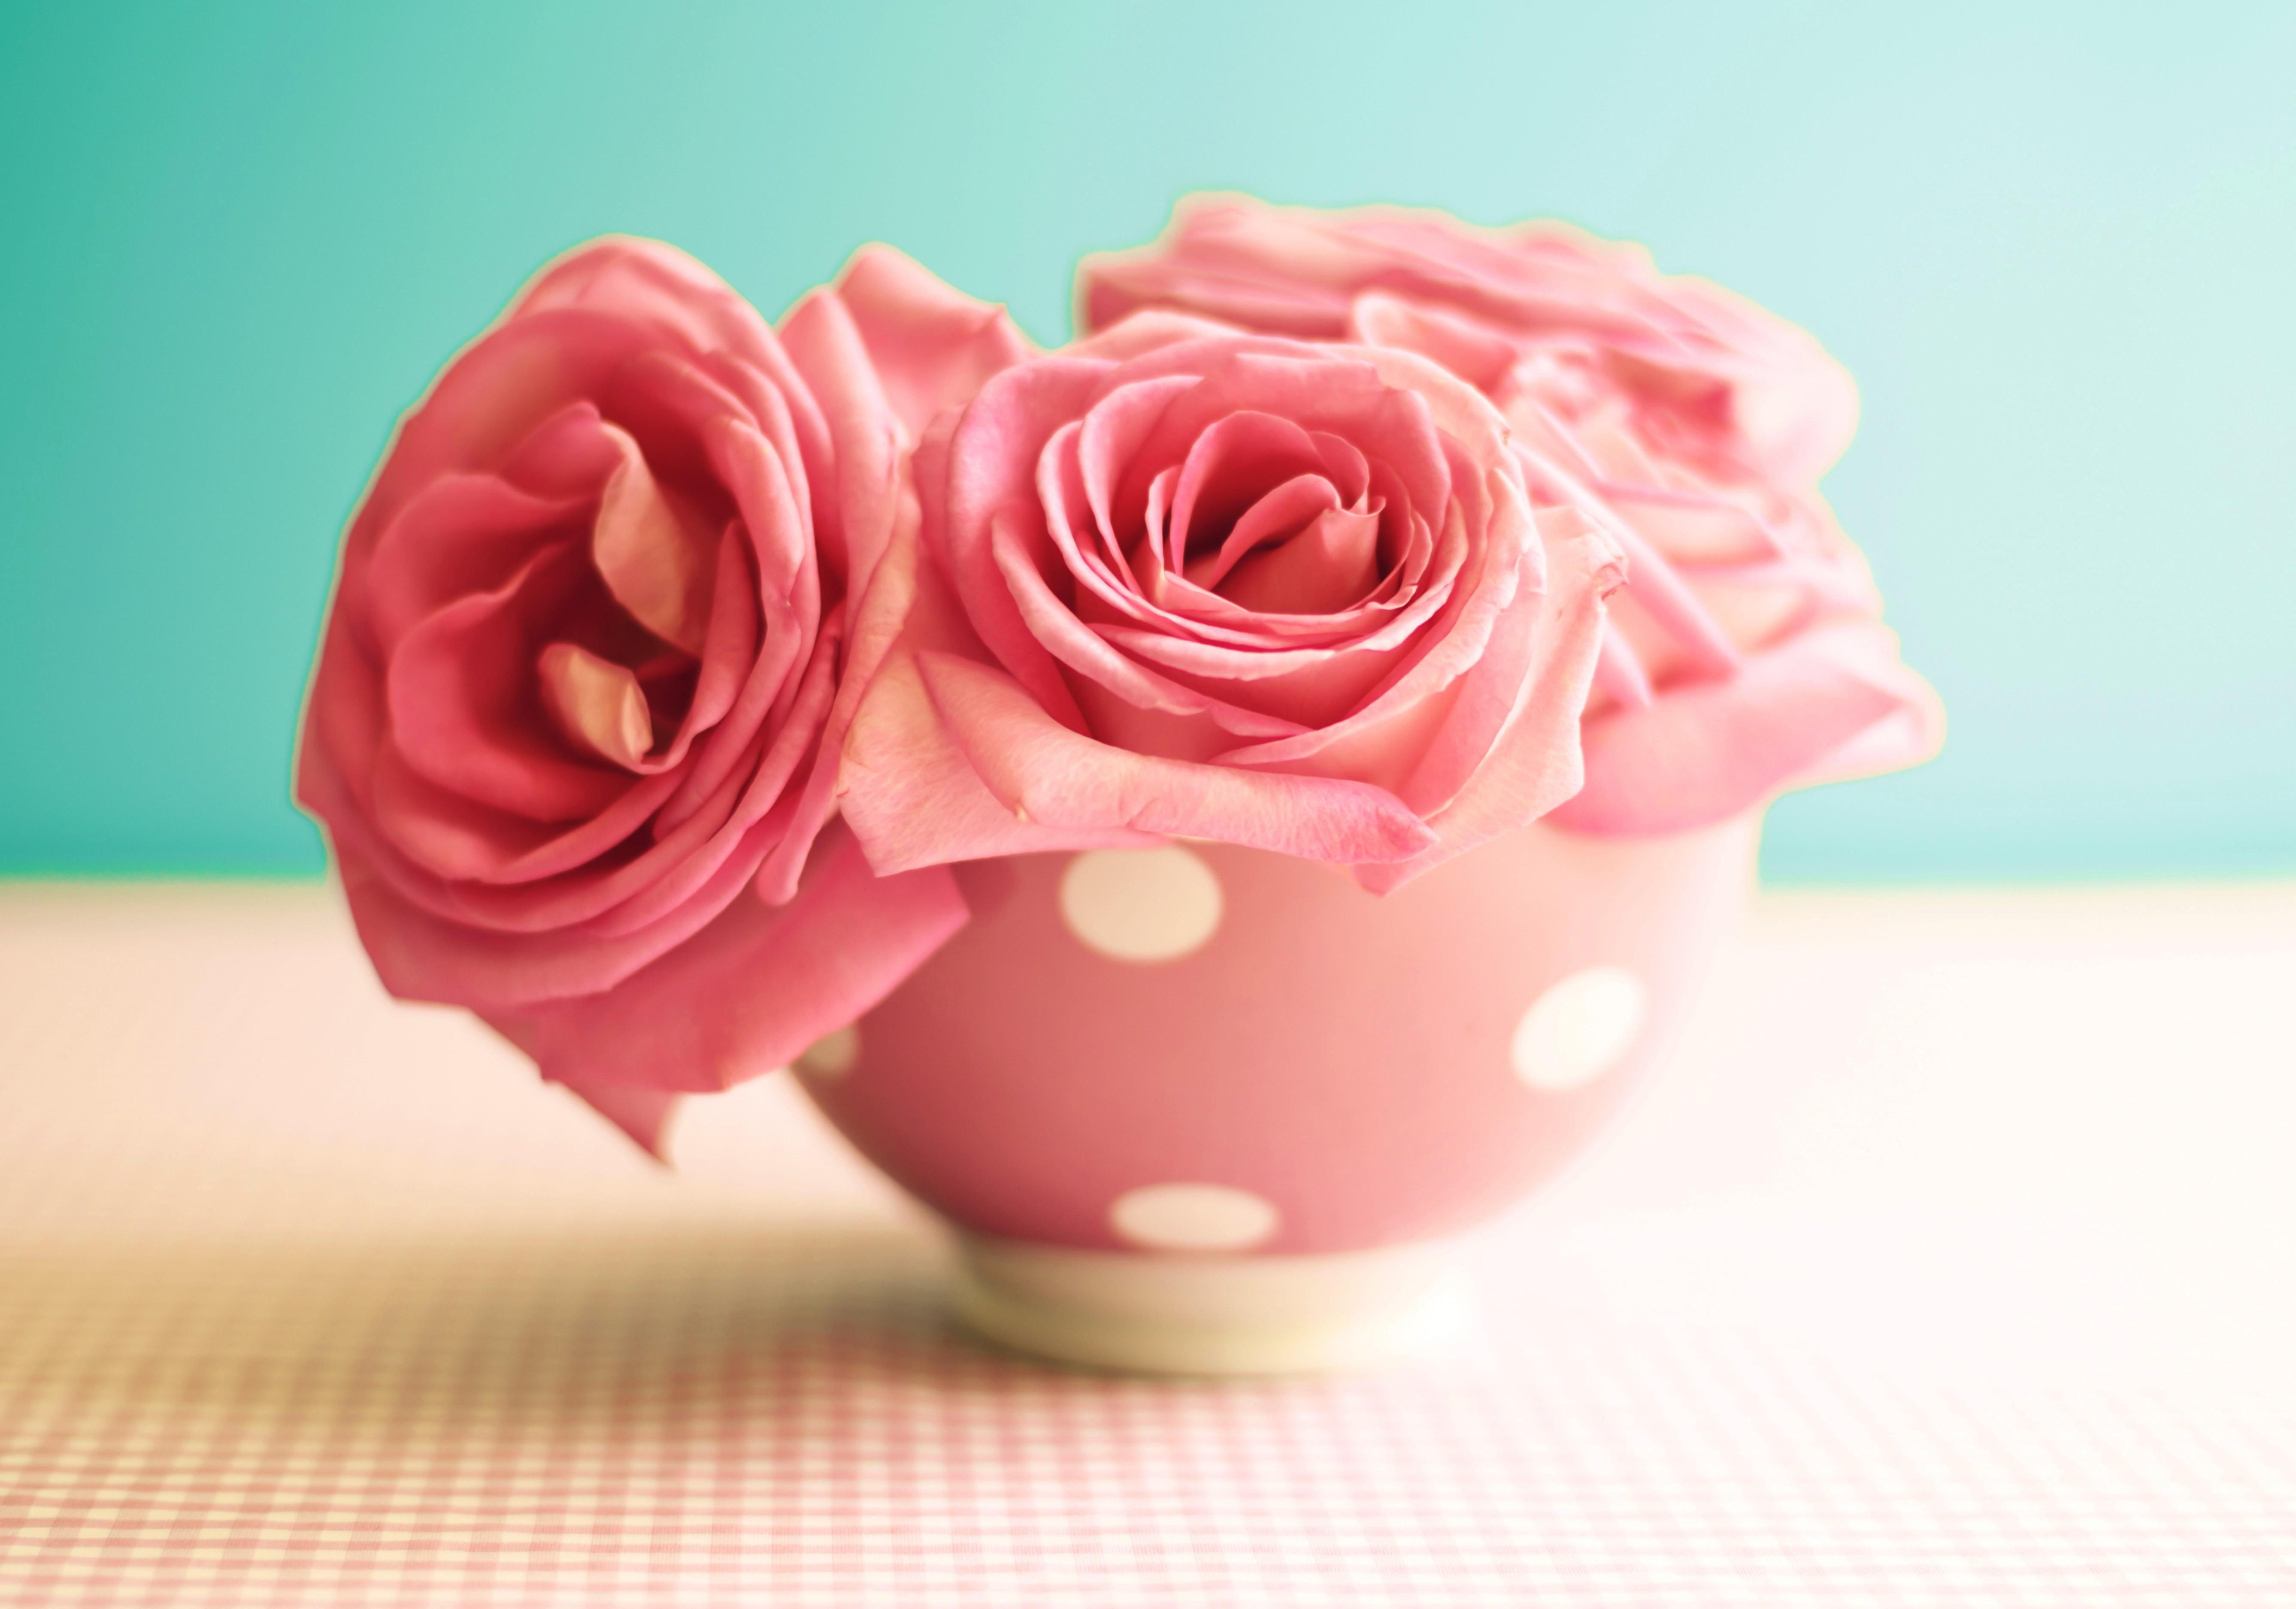 Wallpaper roses 5k 4k wallpaper 8k flowers pink mug nature 6477 your resolution 1024x1024 mightylinksfo